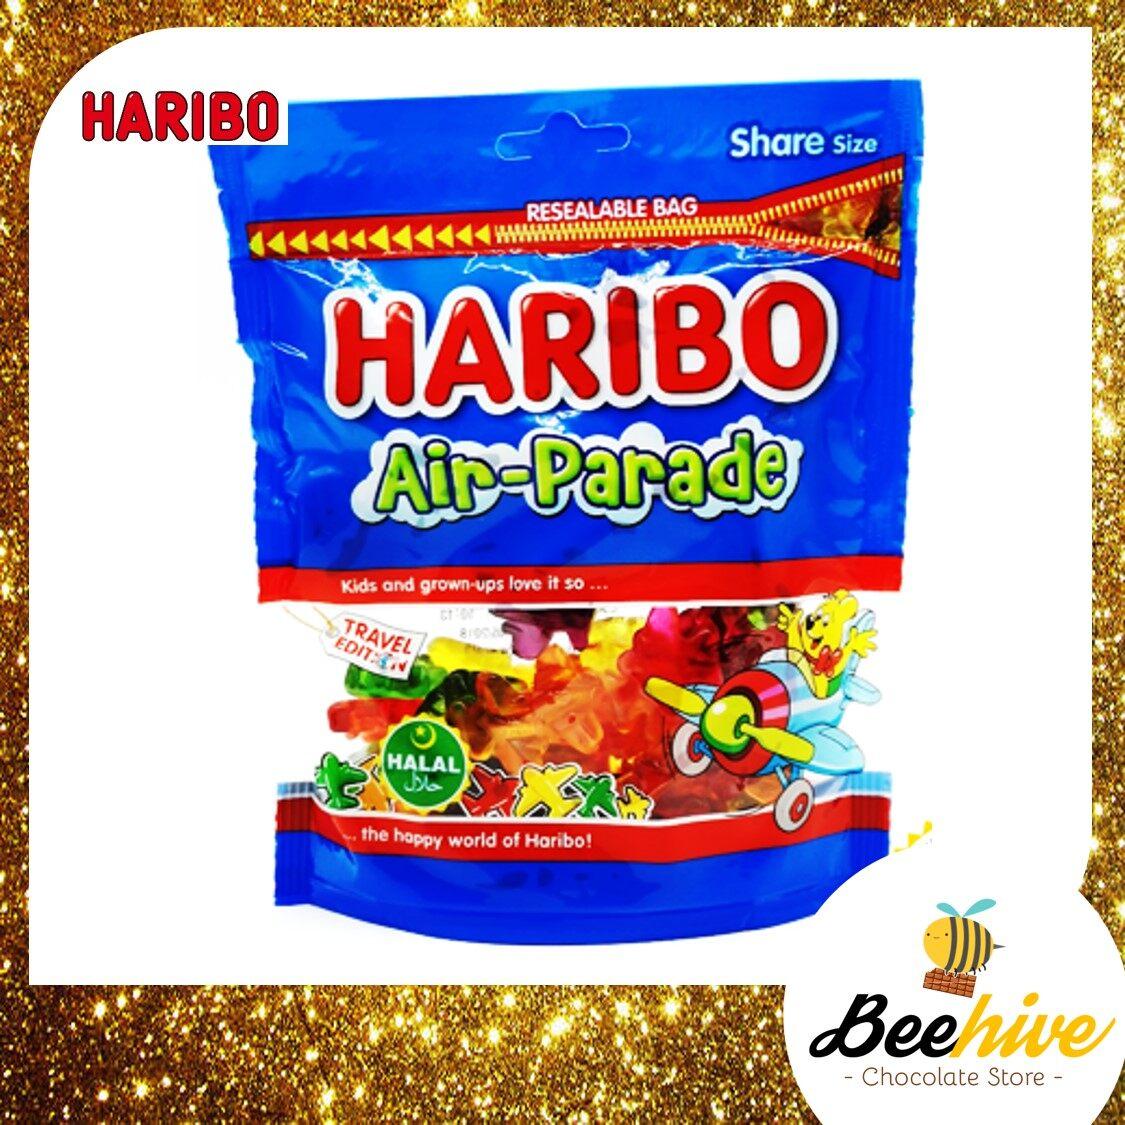 Haribo Air Parade Gummy Candy 300g